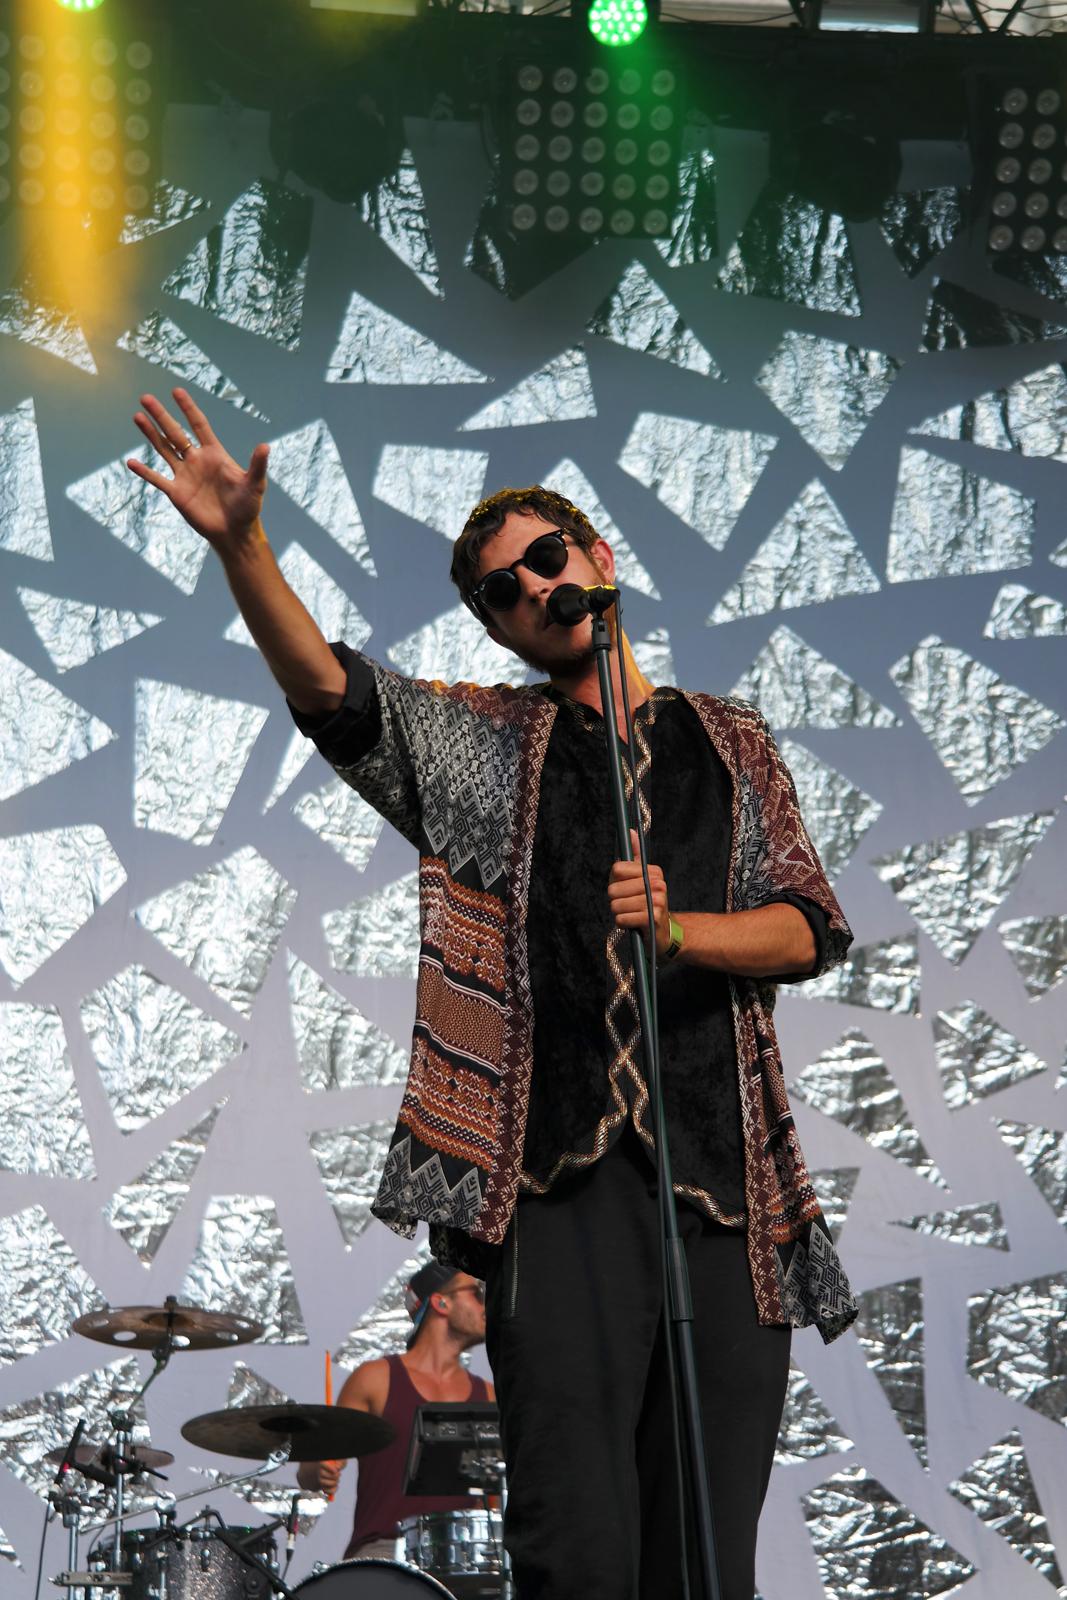 Oscar-and-the-wolf-live-concert-festival-fnaclive-2015-france-album-entity-tour-stage-photo-scène-max-colombie-by-united-states-of-paris-blog